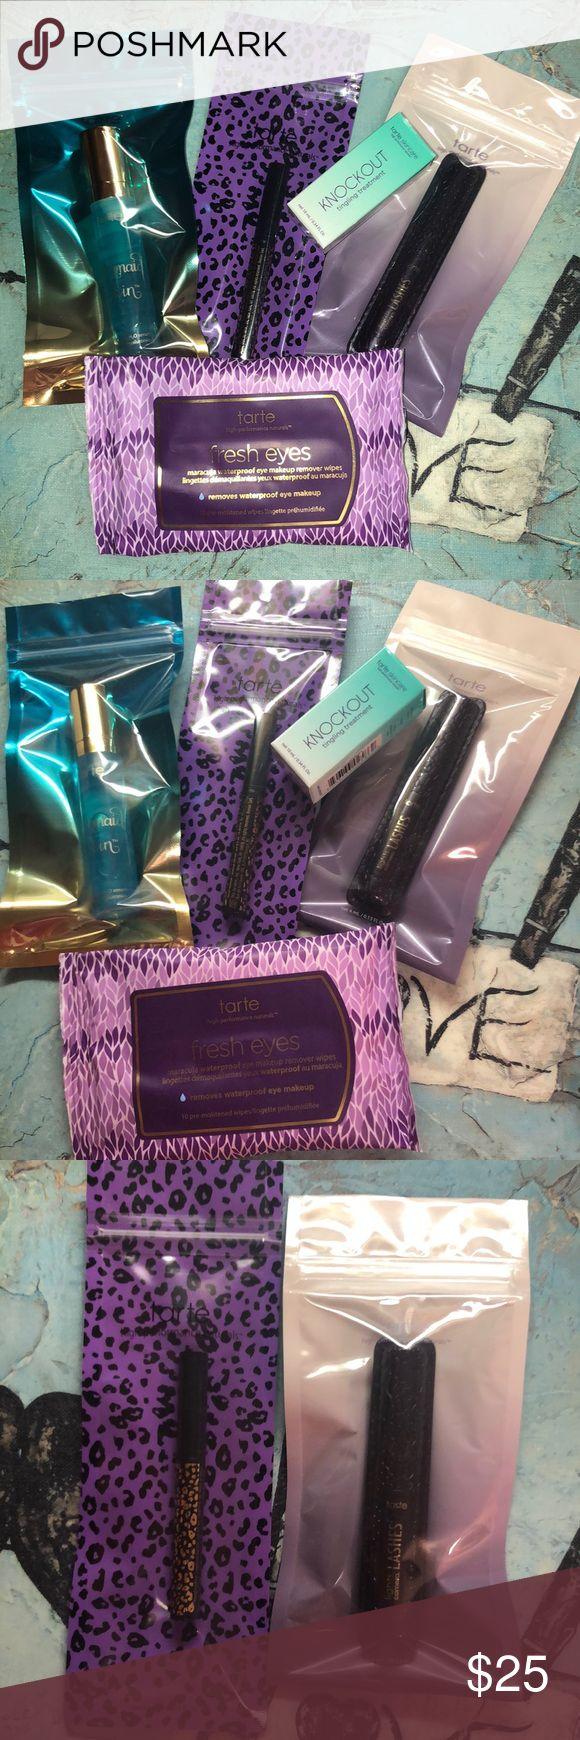 Tarte Makeup Bundle Tarte Makeup Bundle all new unused